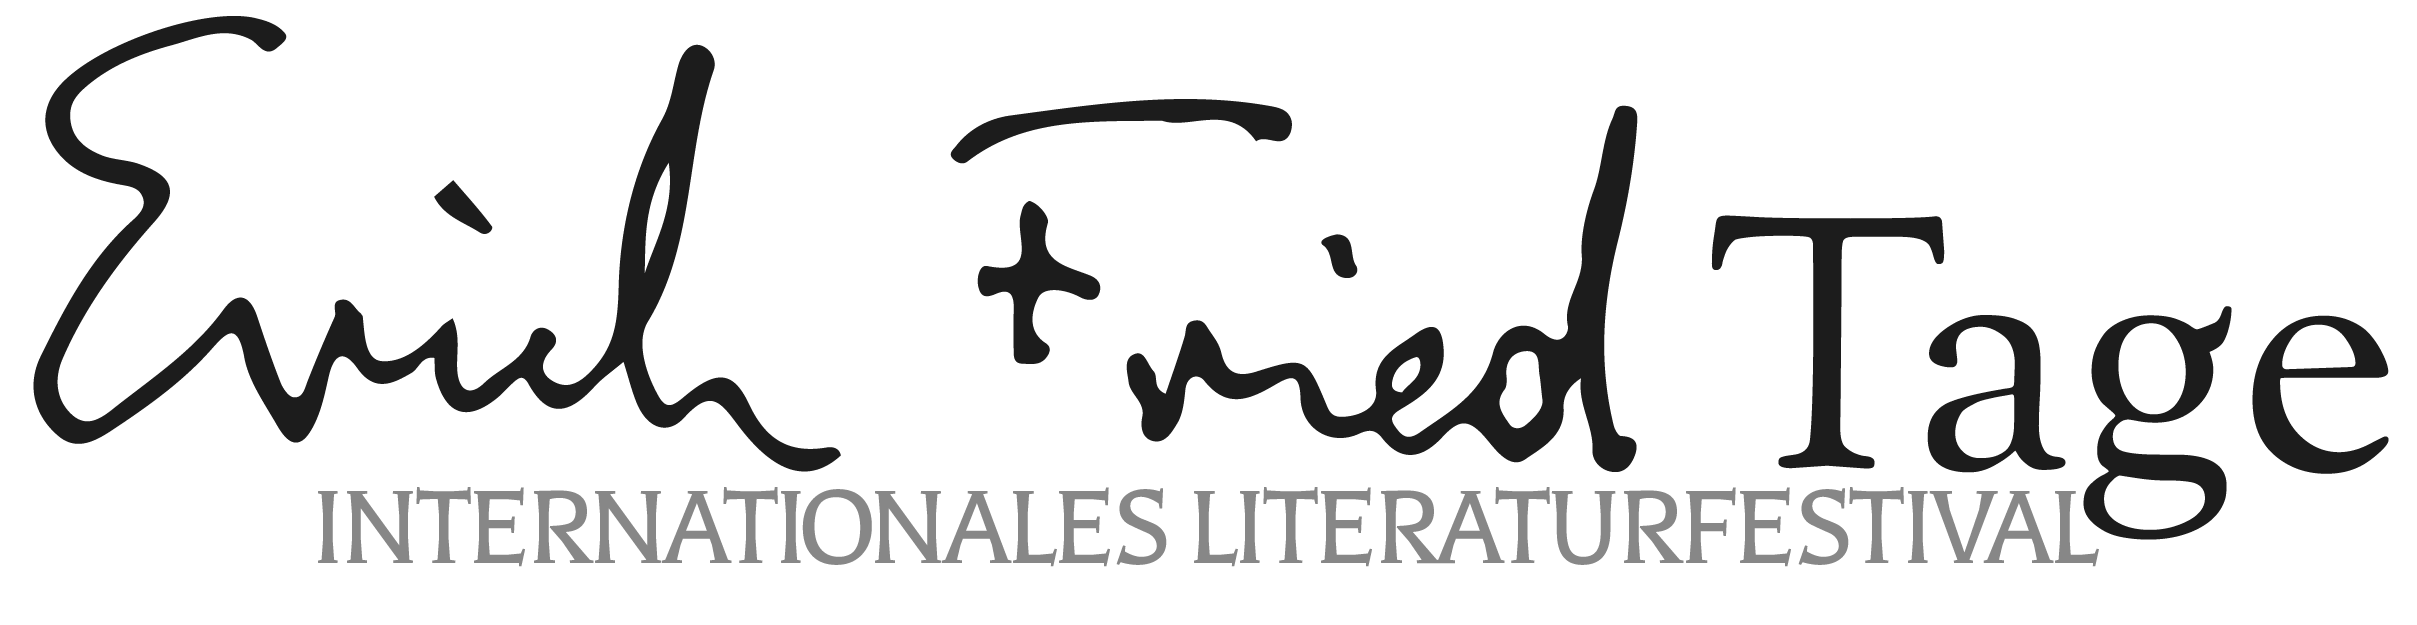 Literaturfestival | Erich Fried Tage